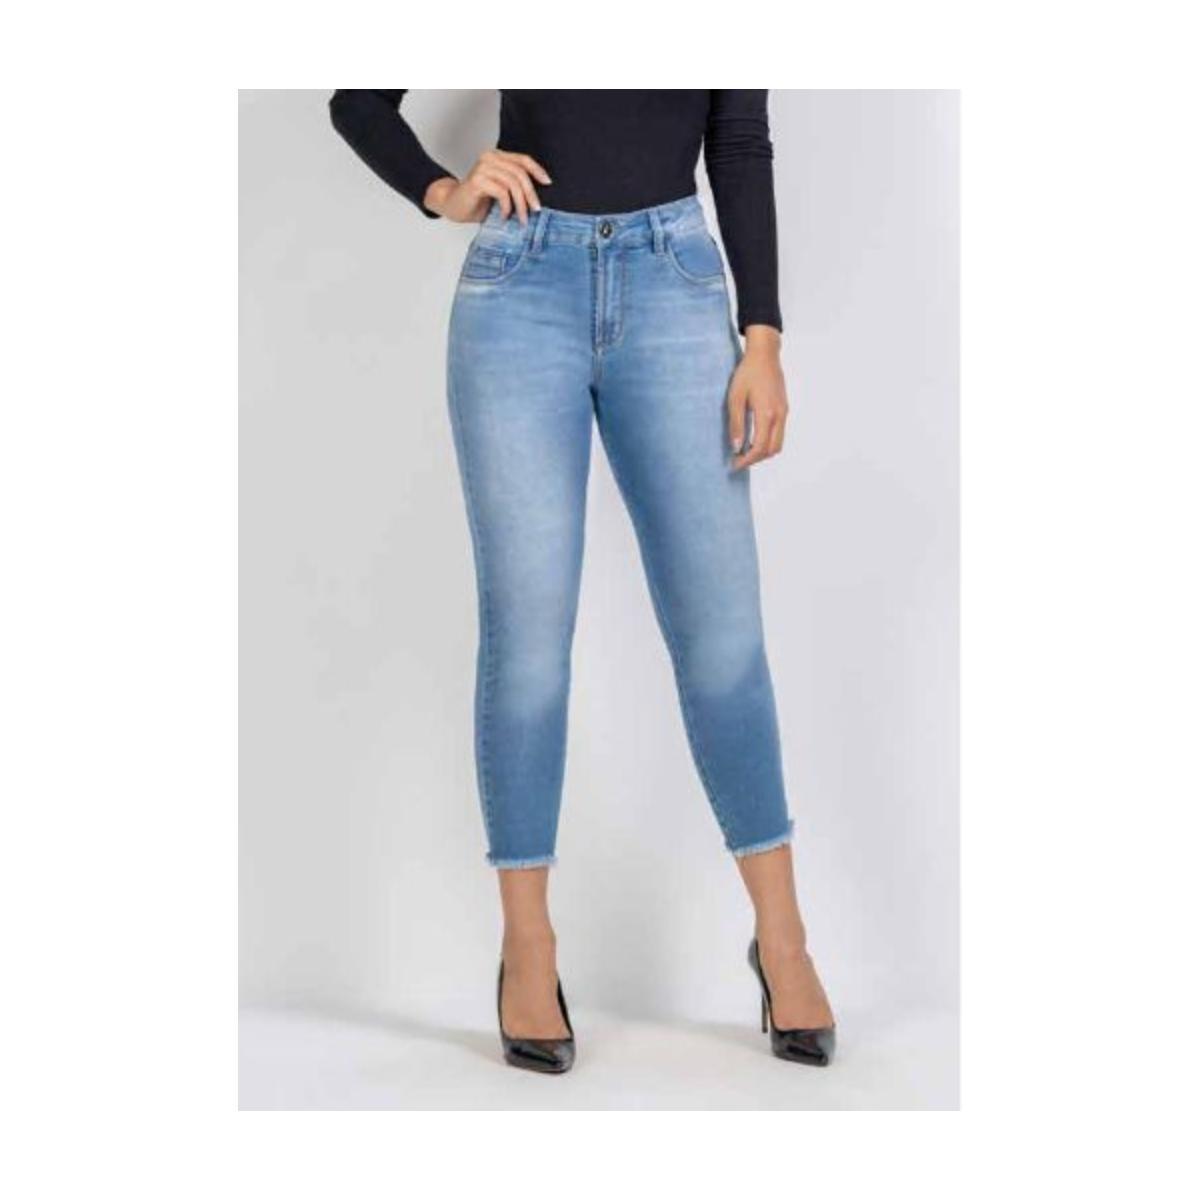 Calça Feminina Kacolako K37817 Jeans